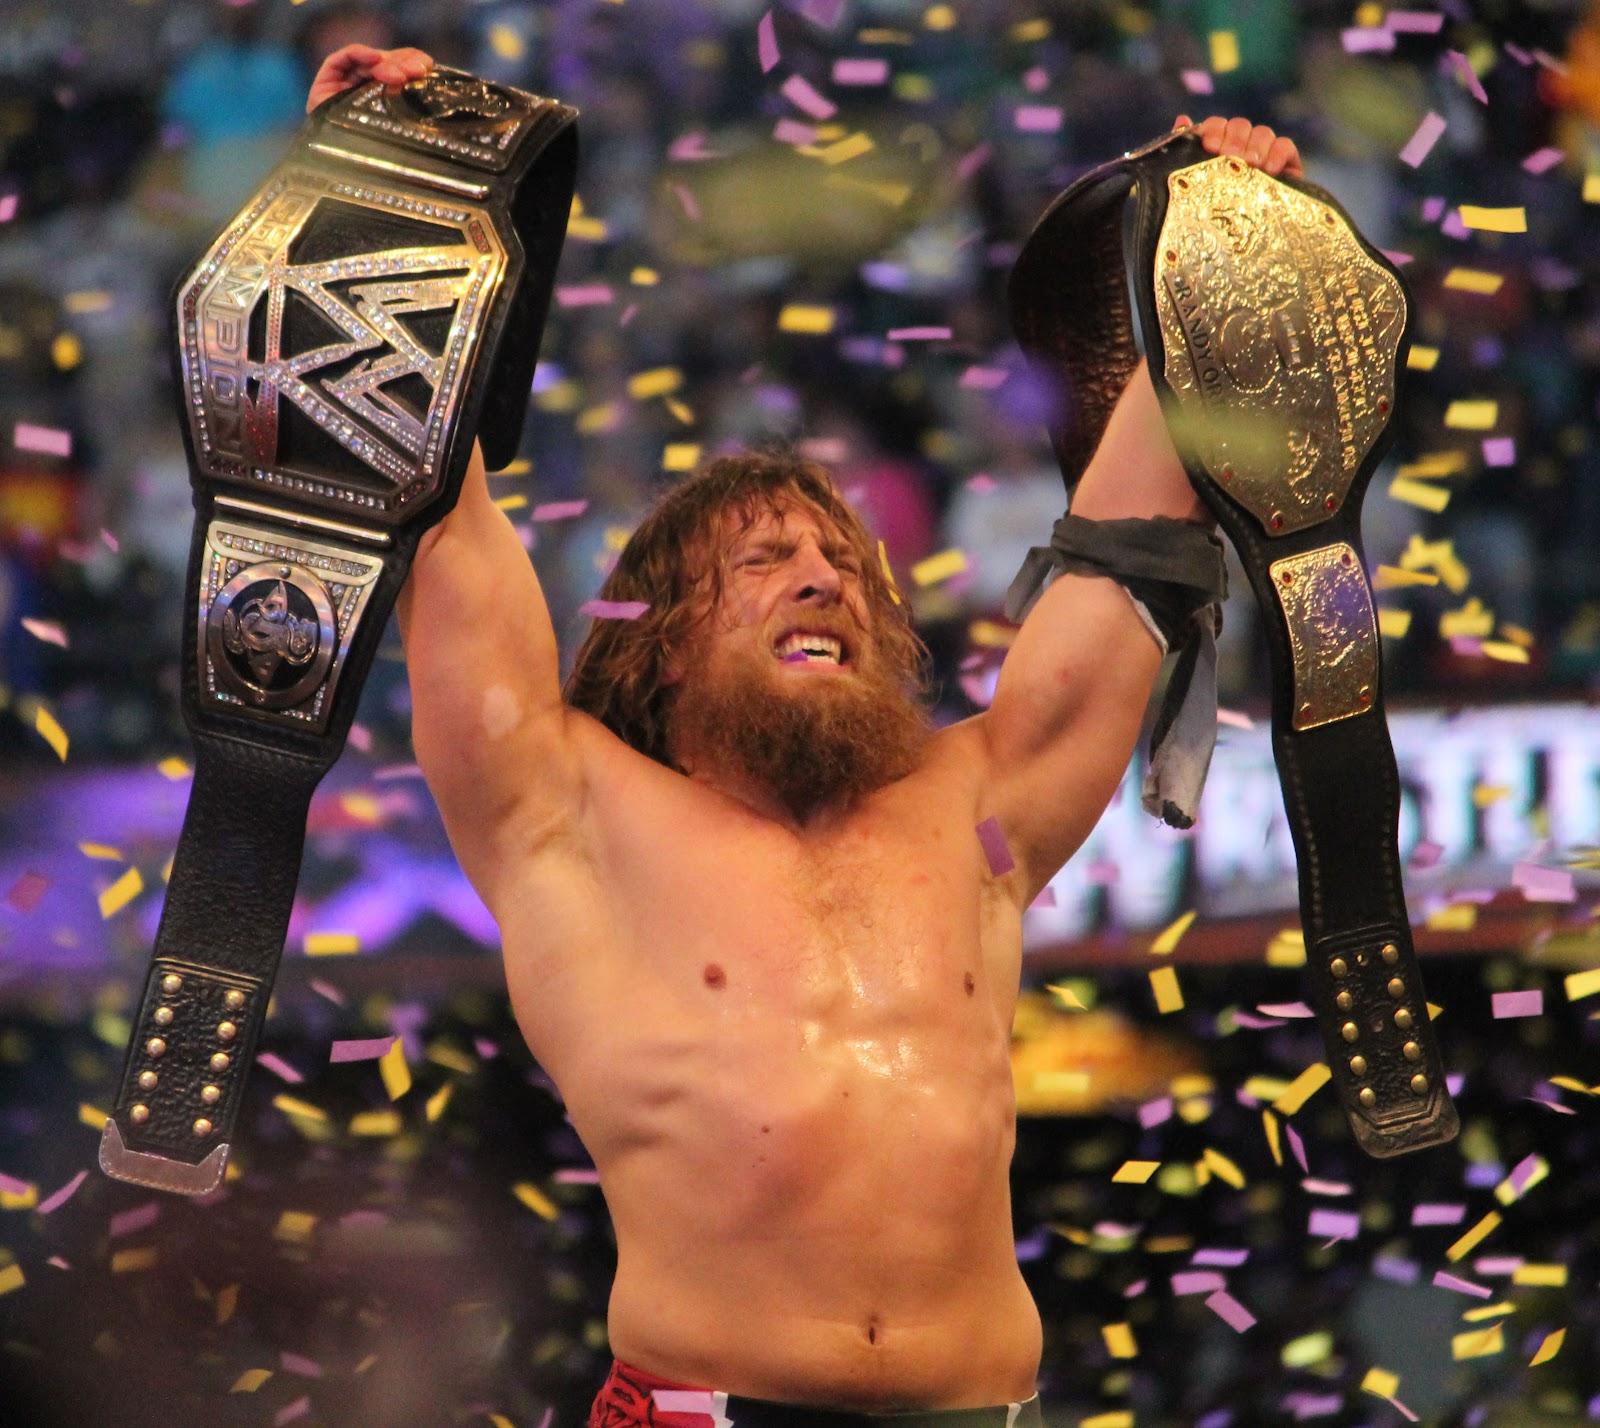 the WWE World Heavyweight